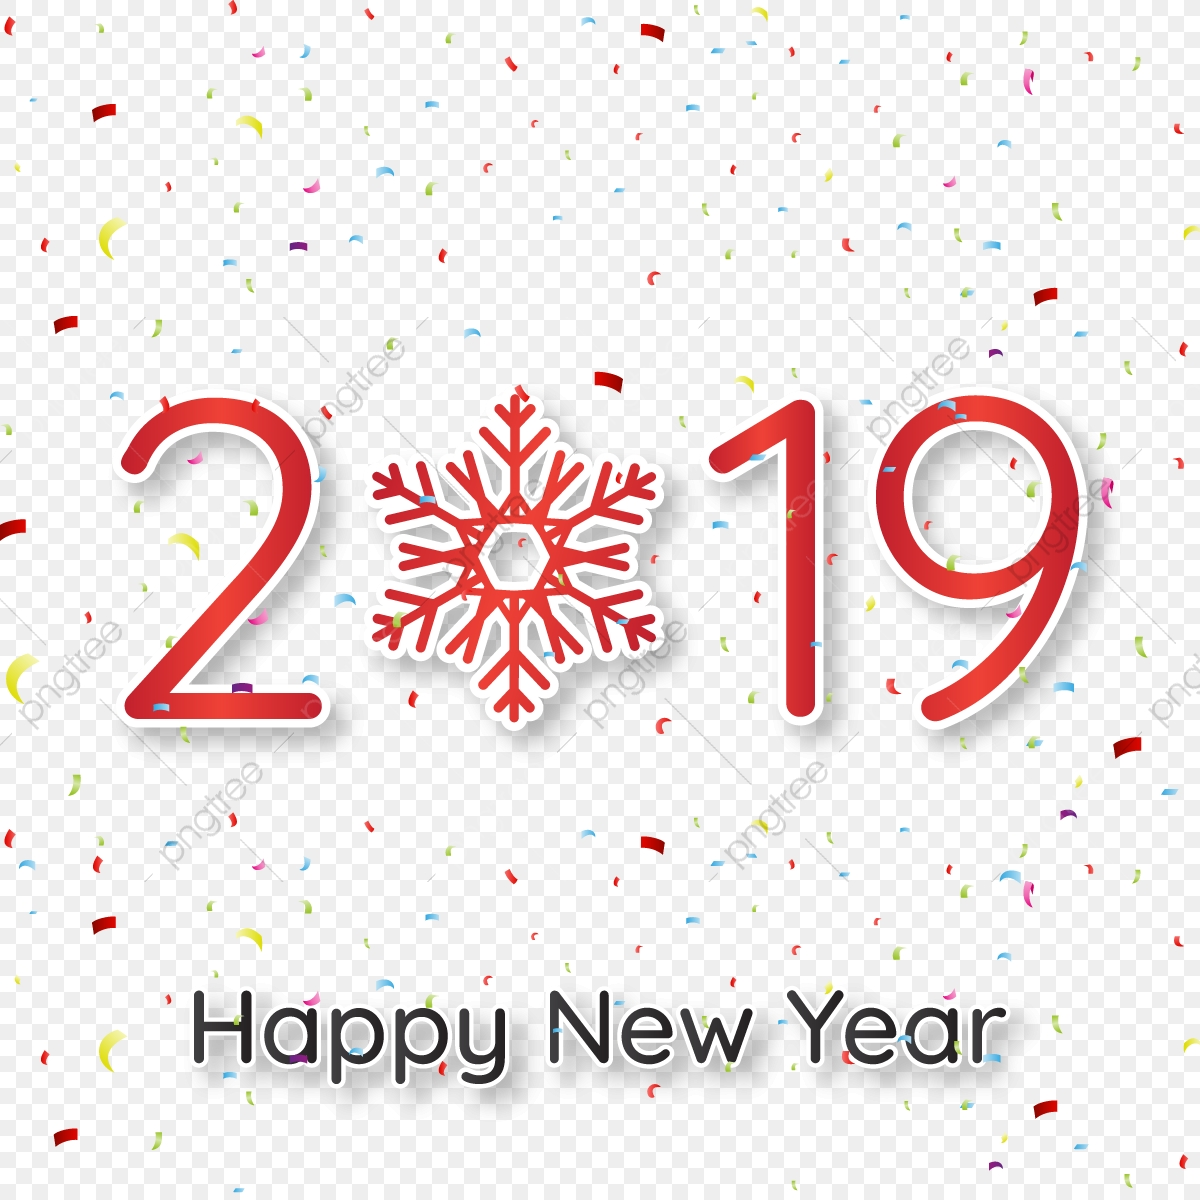 Happy New Year Transparent 63